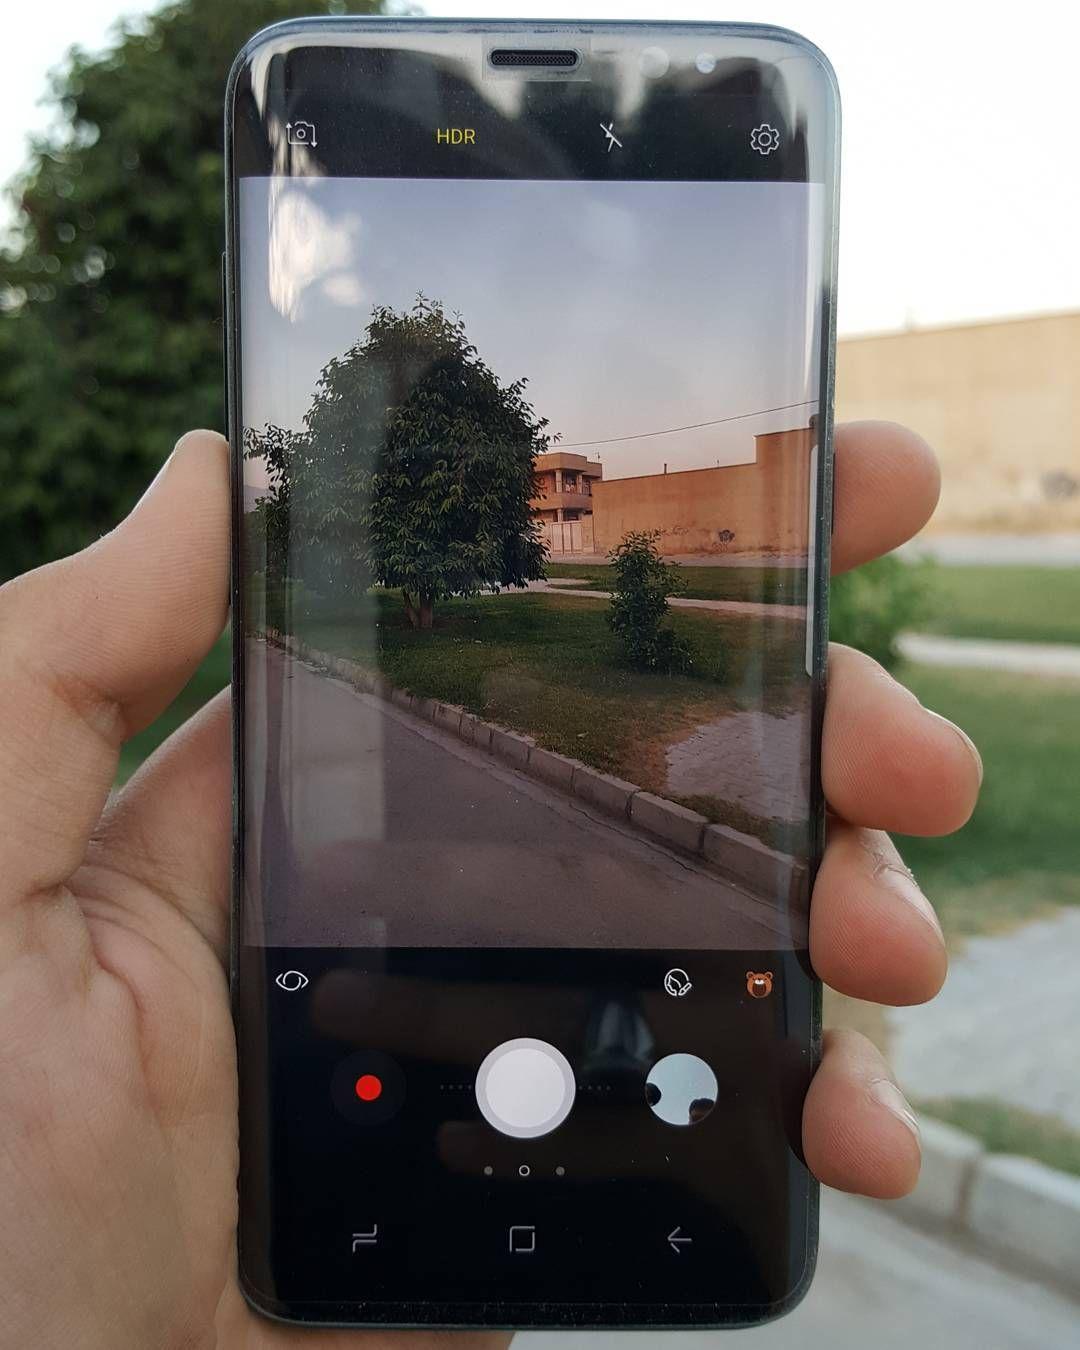 Samsung Galaxy S8 Plus Camera Thank You Alireza Z Samsungblog Samsung Galaxy Samsunggalaxy Galaxys8 Gala Aplicativo Para Iphone Iphone Celulares